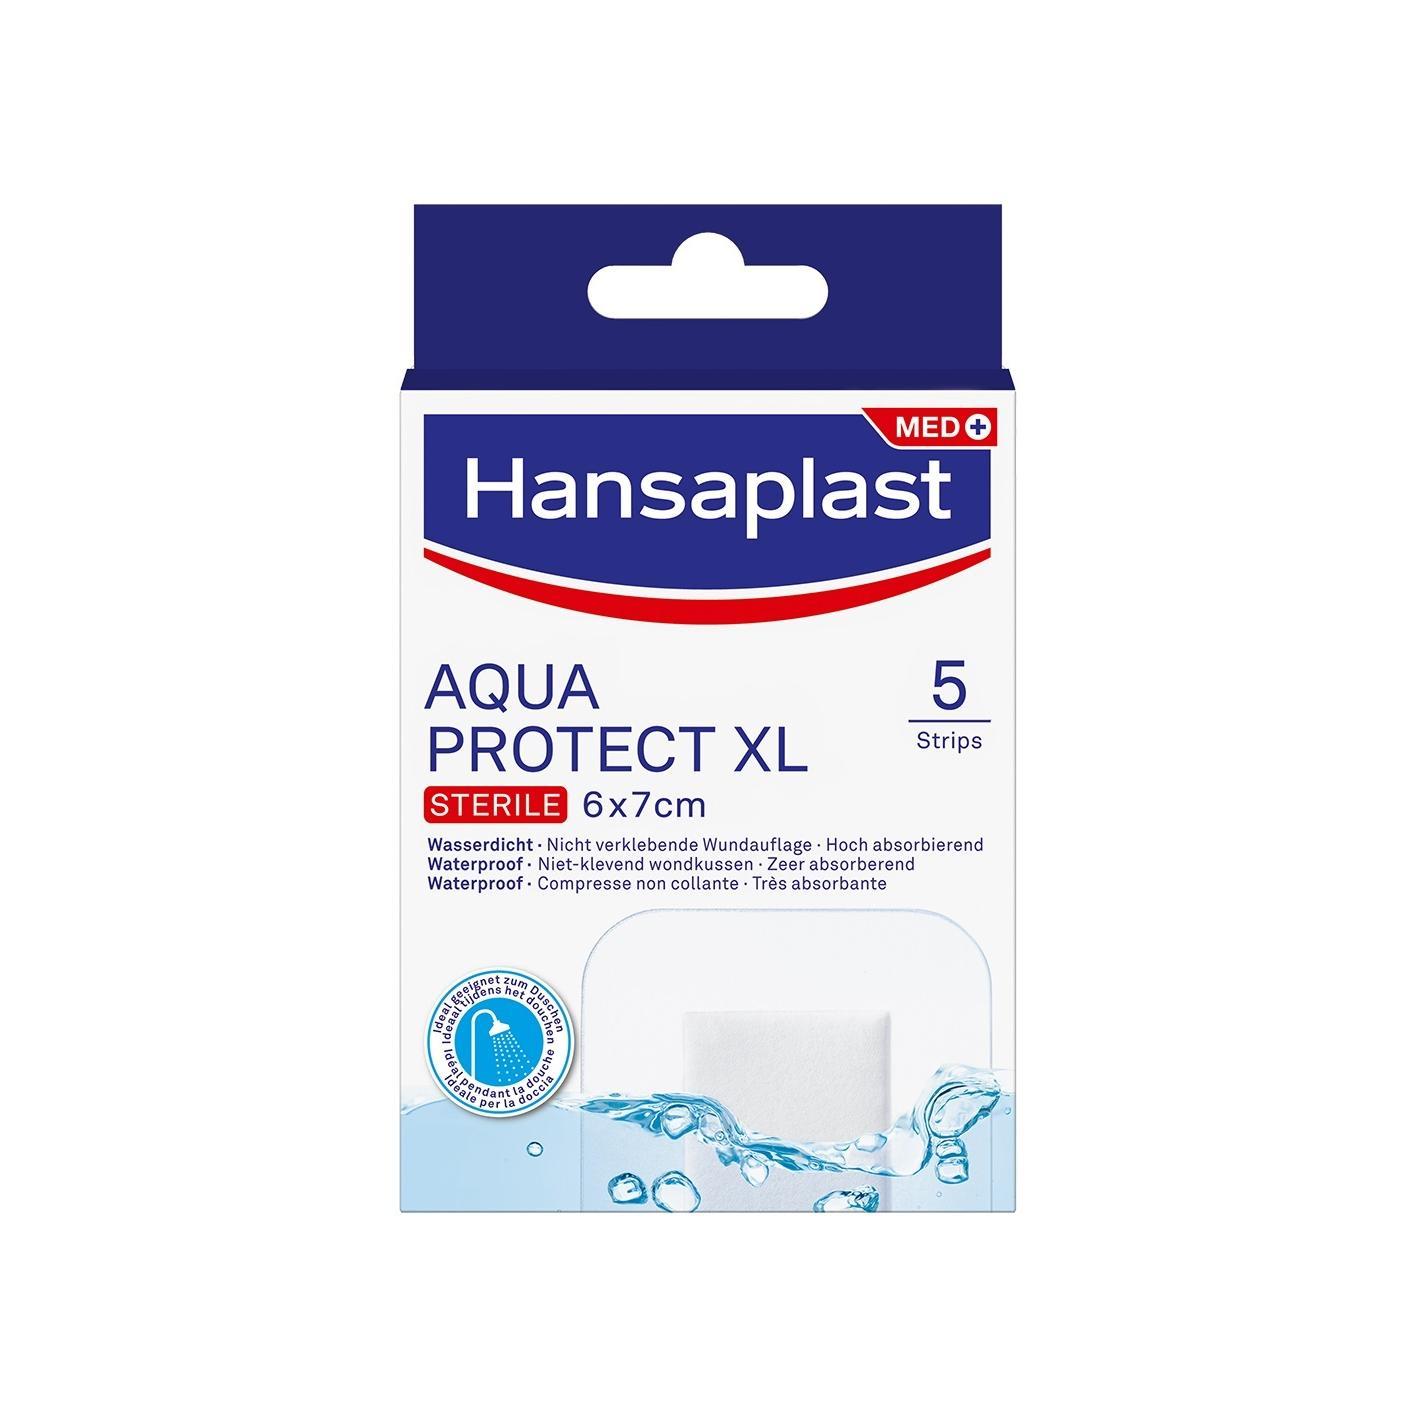 Image of Hansaplast Aqua protect XL 6x7cm